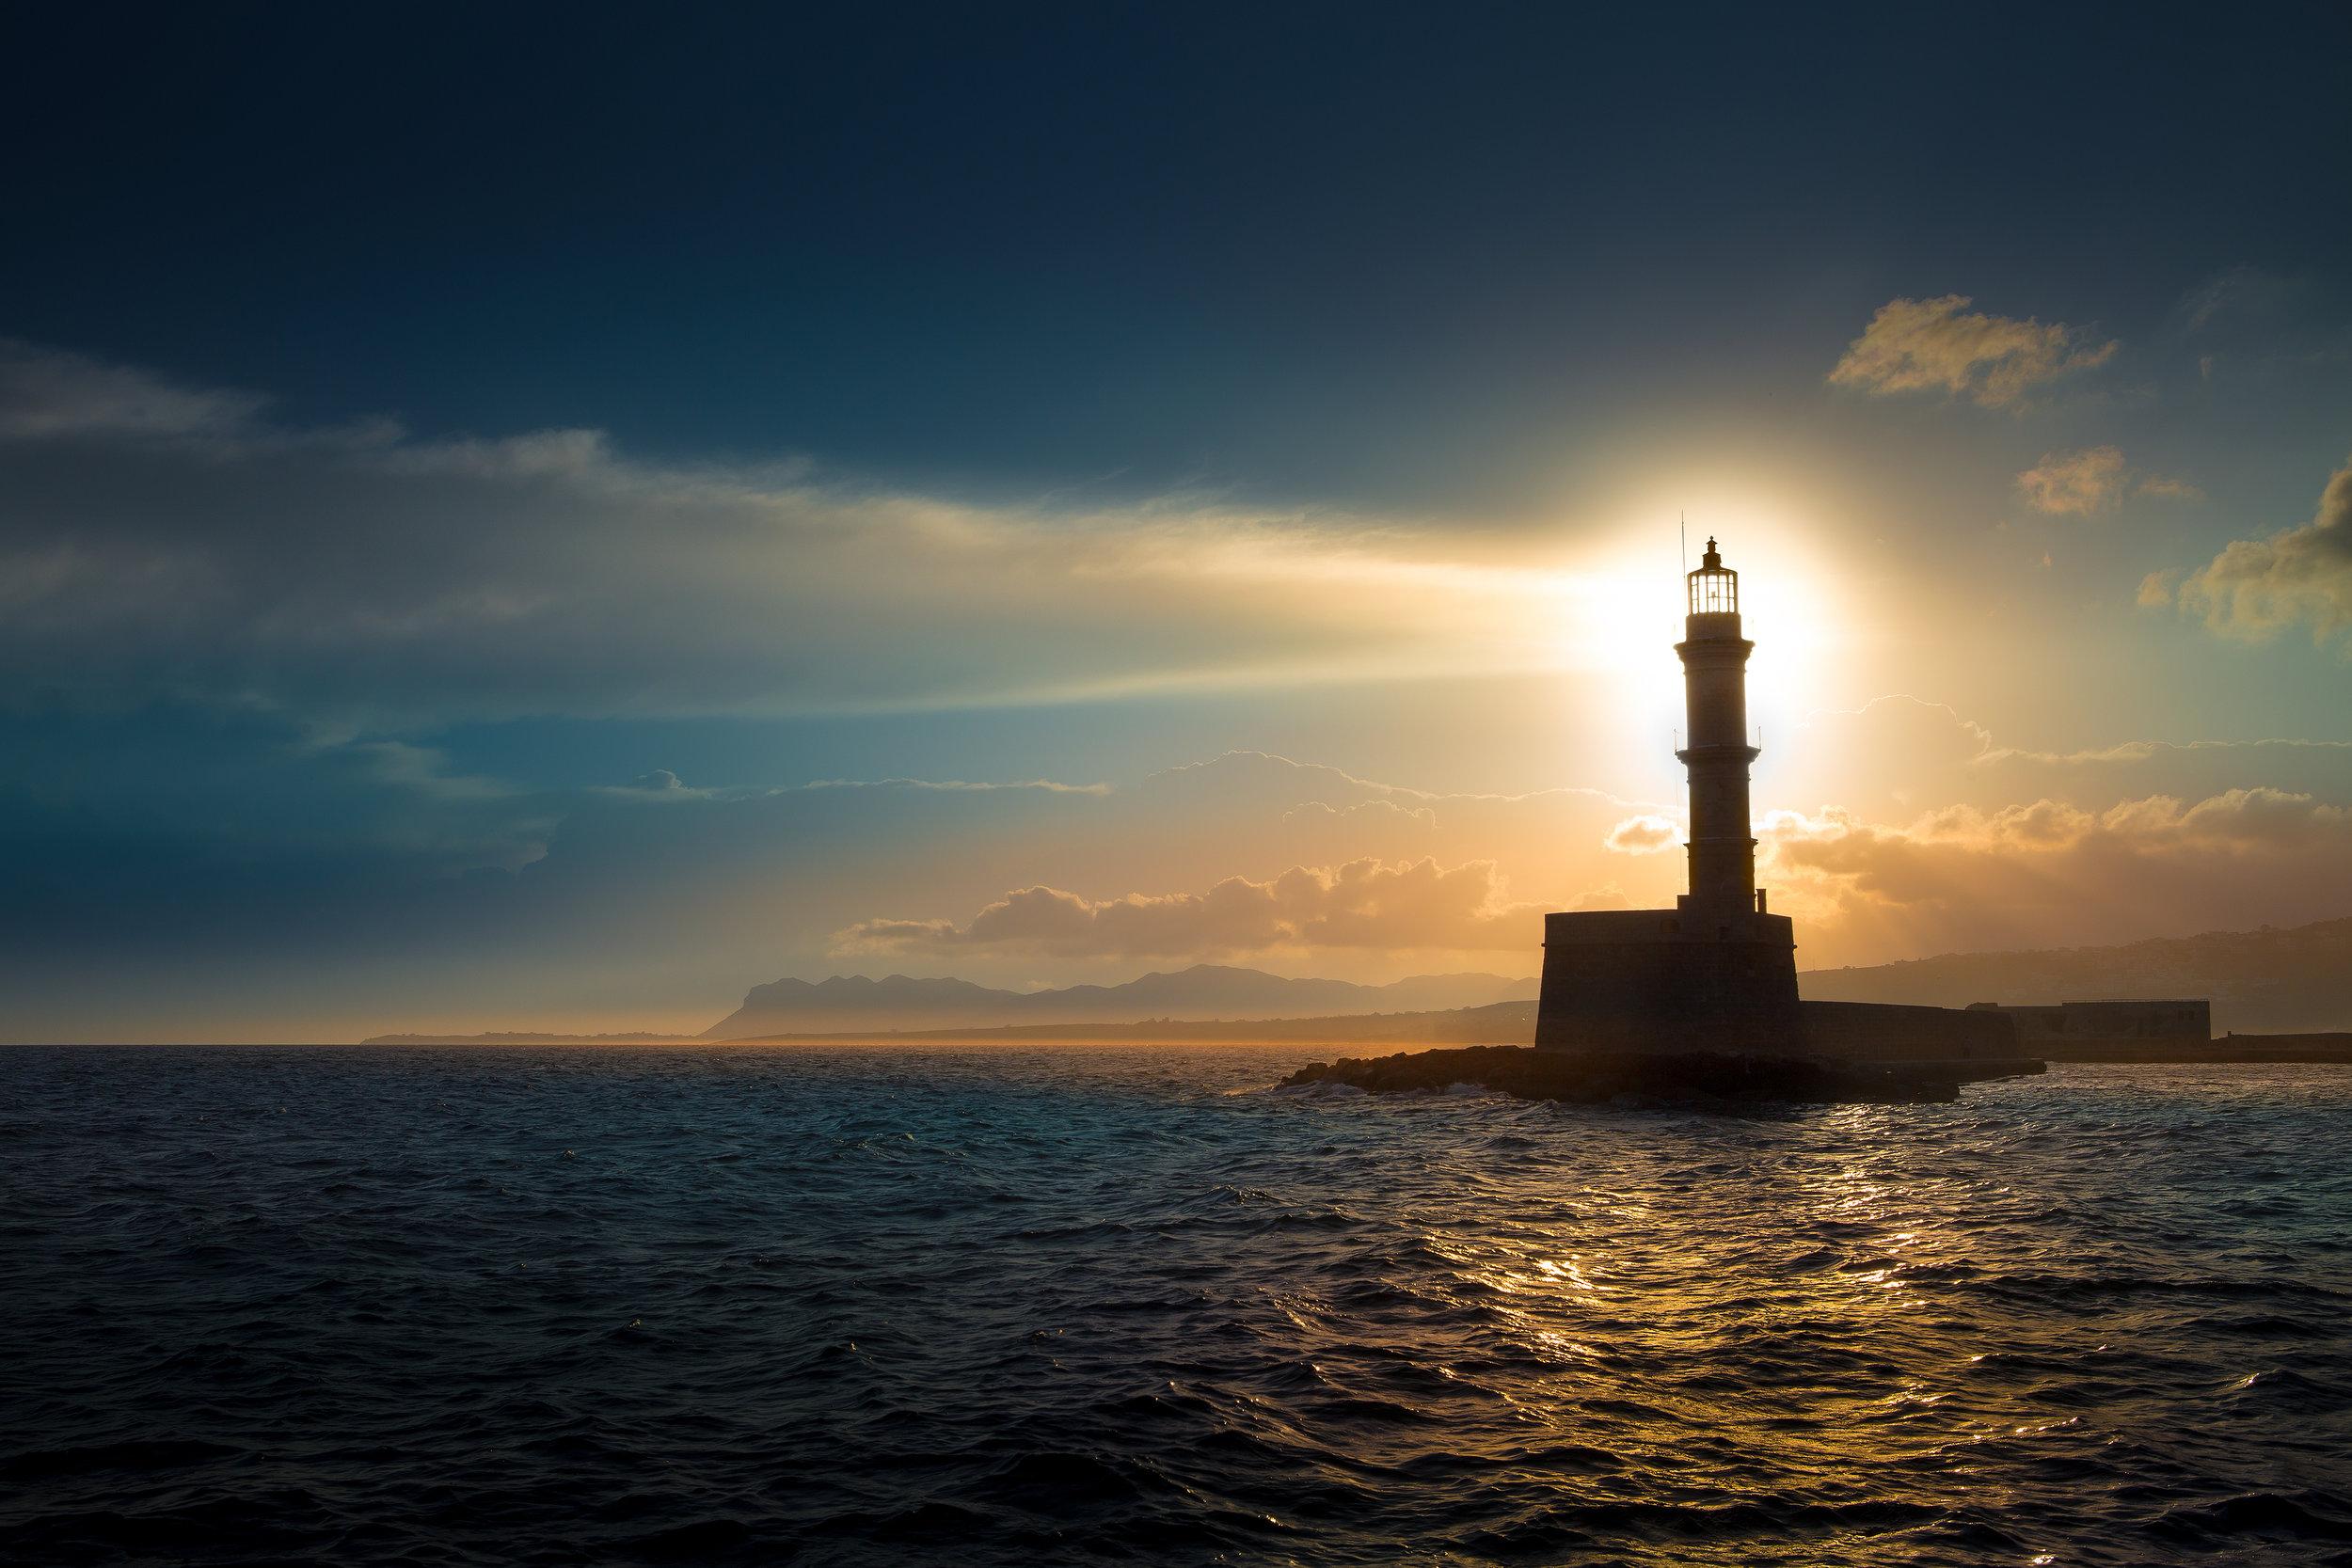 Lighthouse)iStock-486899724.jpg